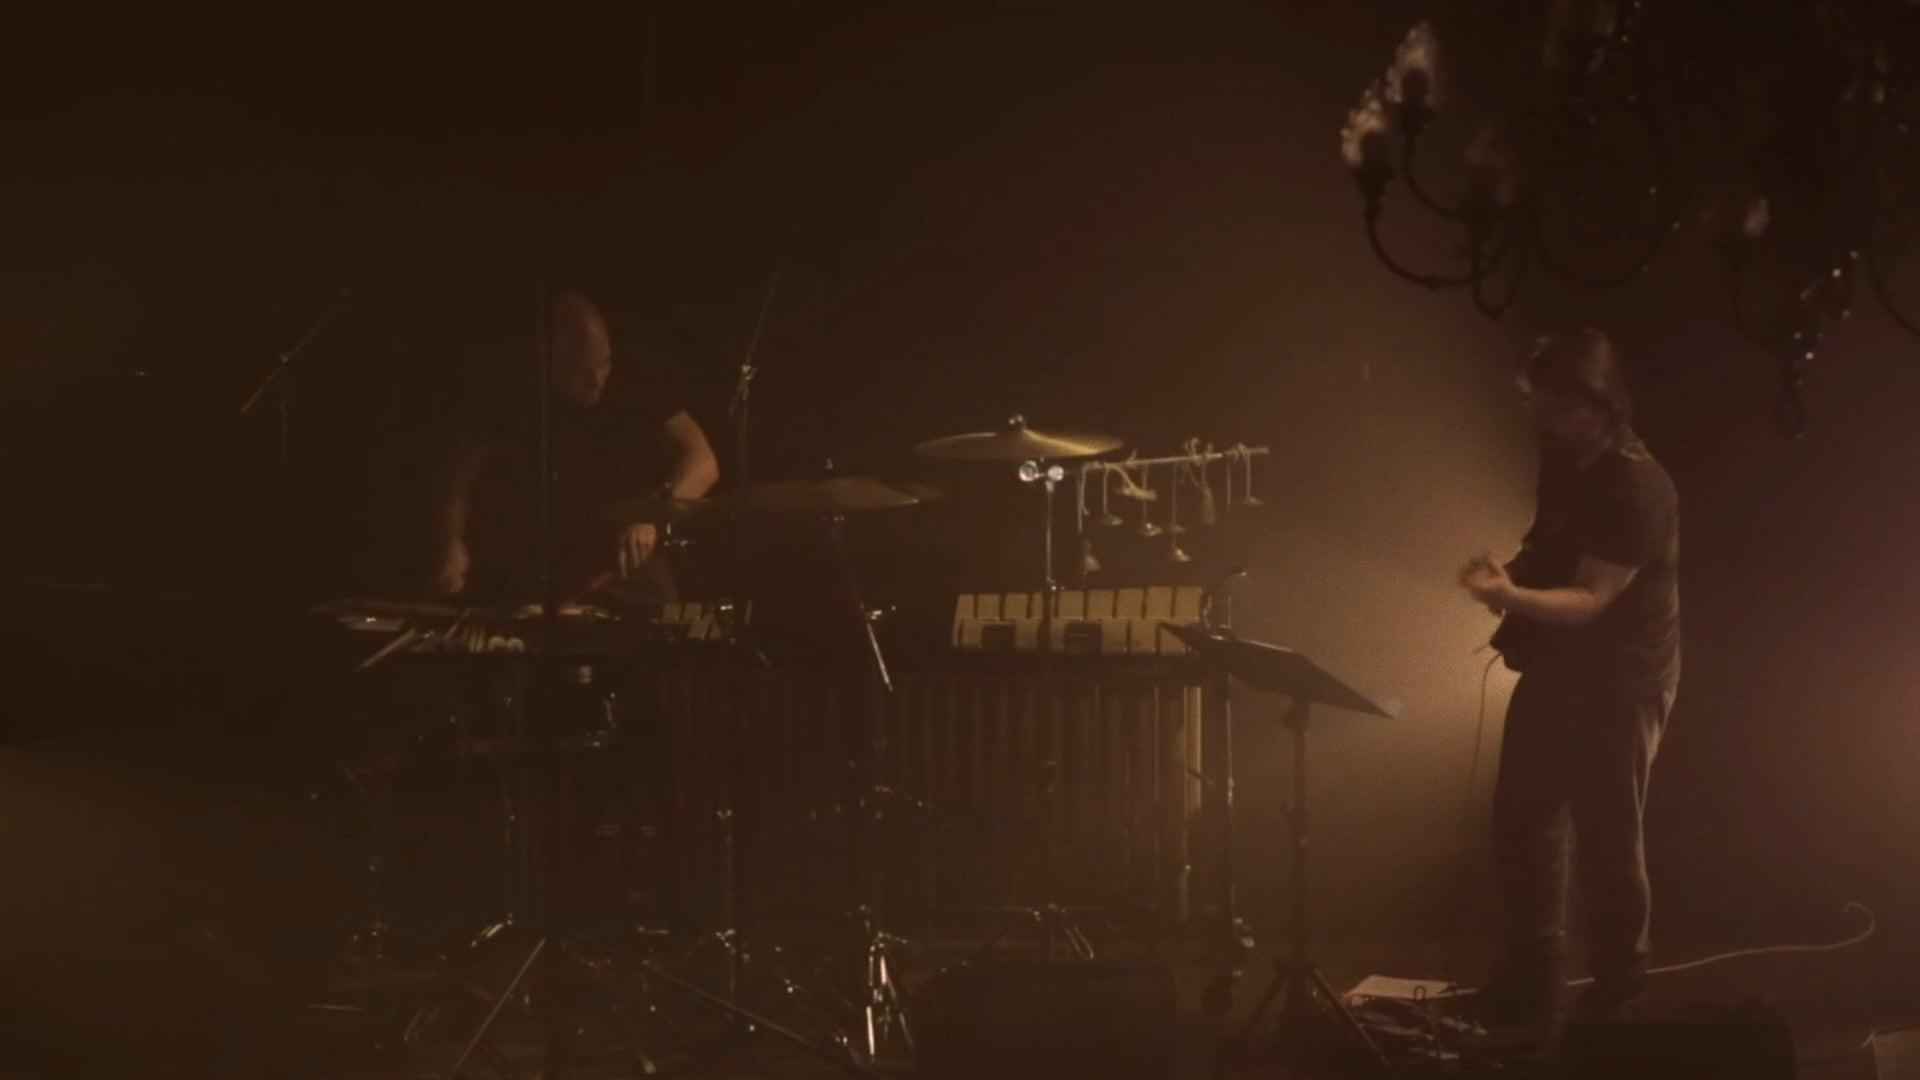 Ensemble Klang + Kit Downes (trailer)